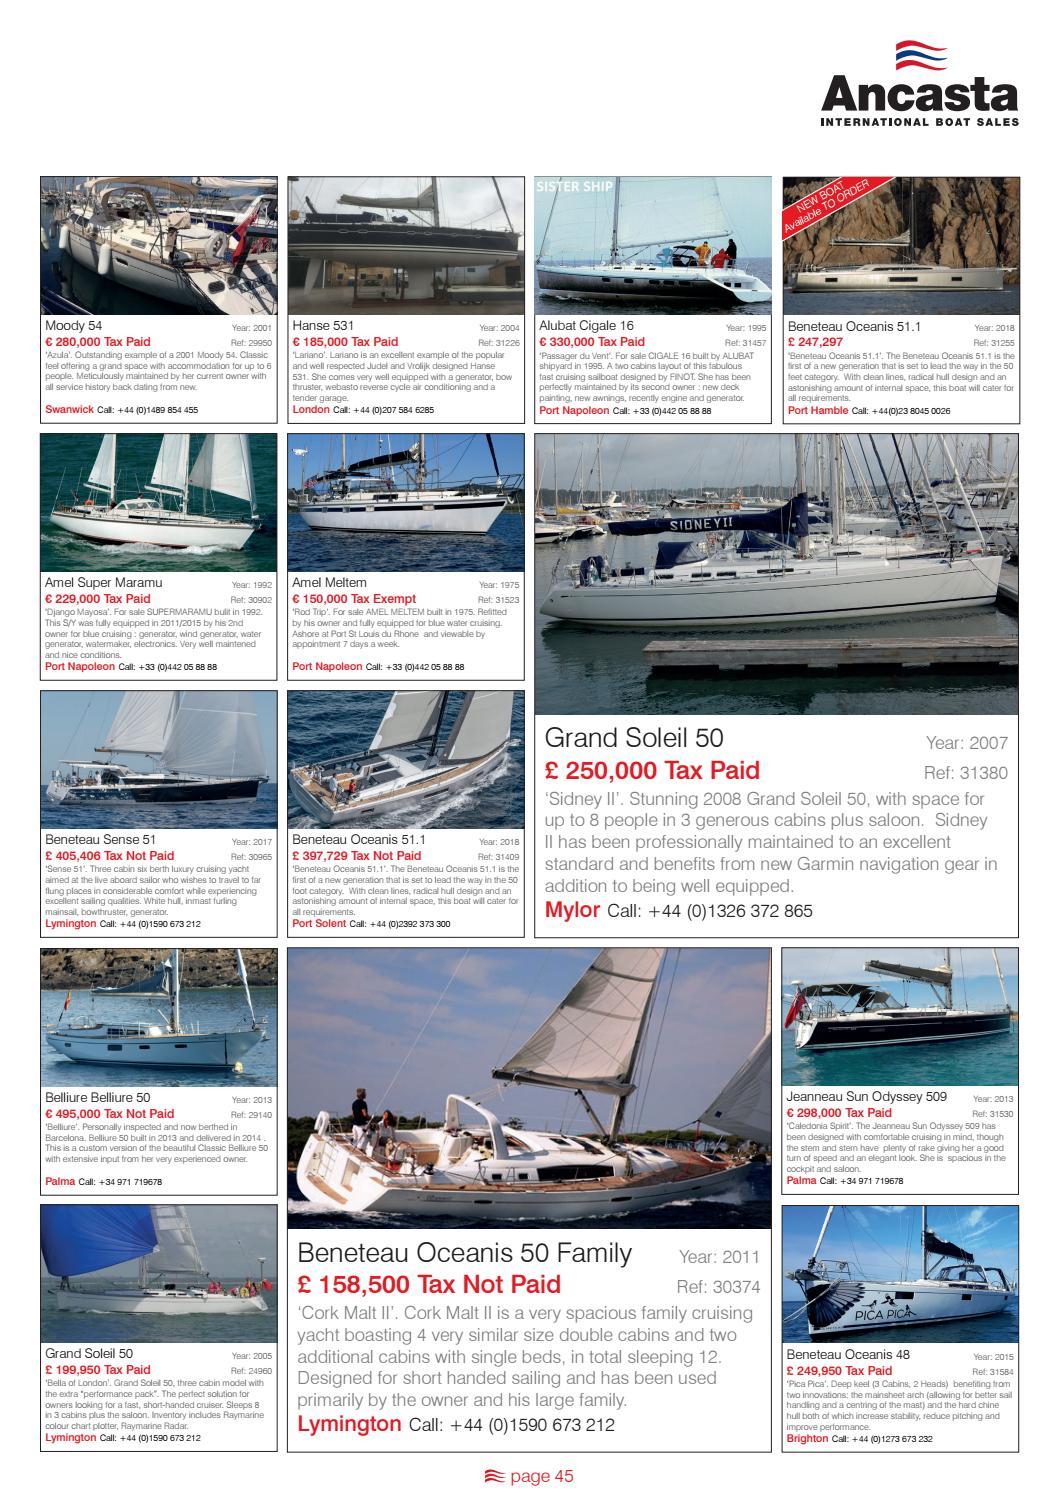 bda7c9eea0968 18 ancasta winter collection issuu by Ancasta International Boat Sales -  issuu